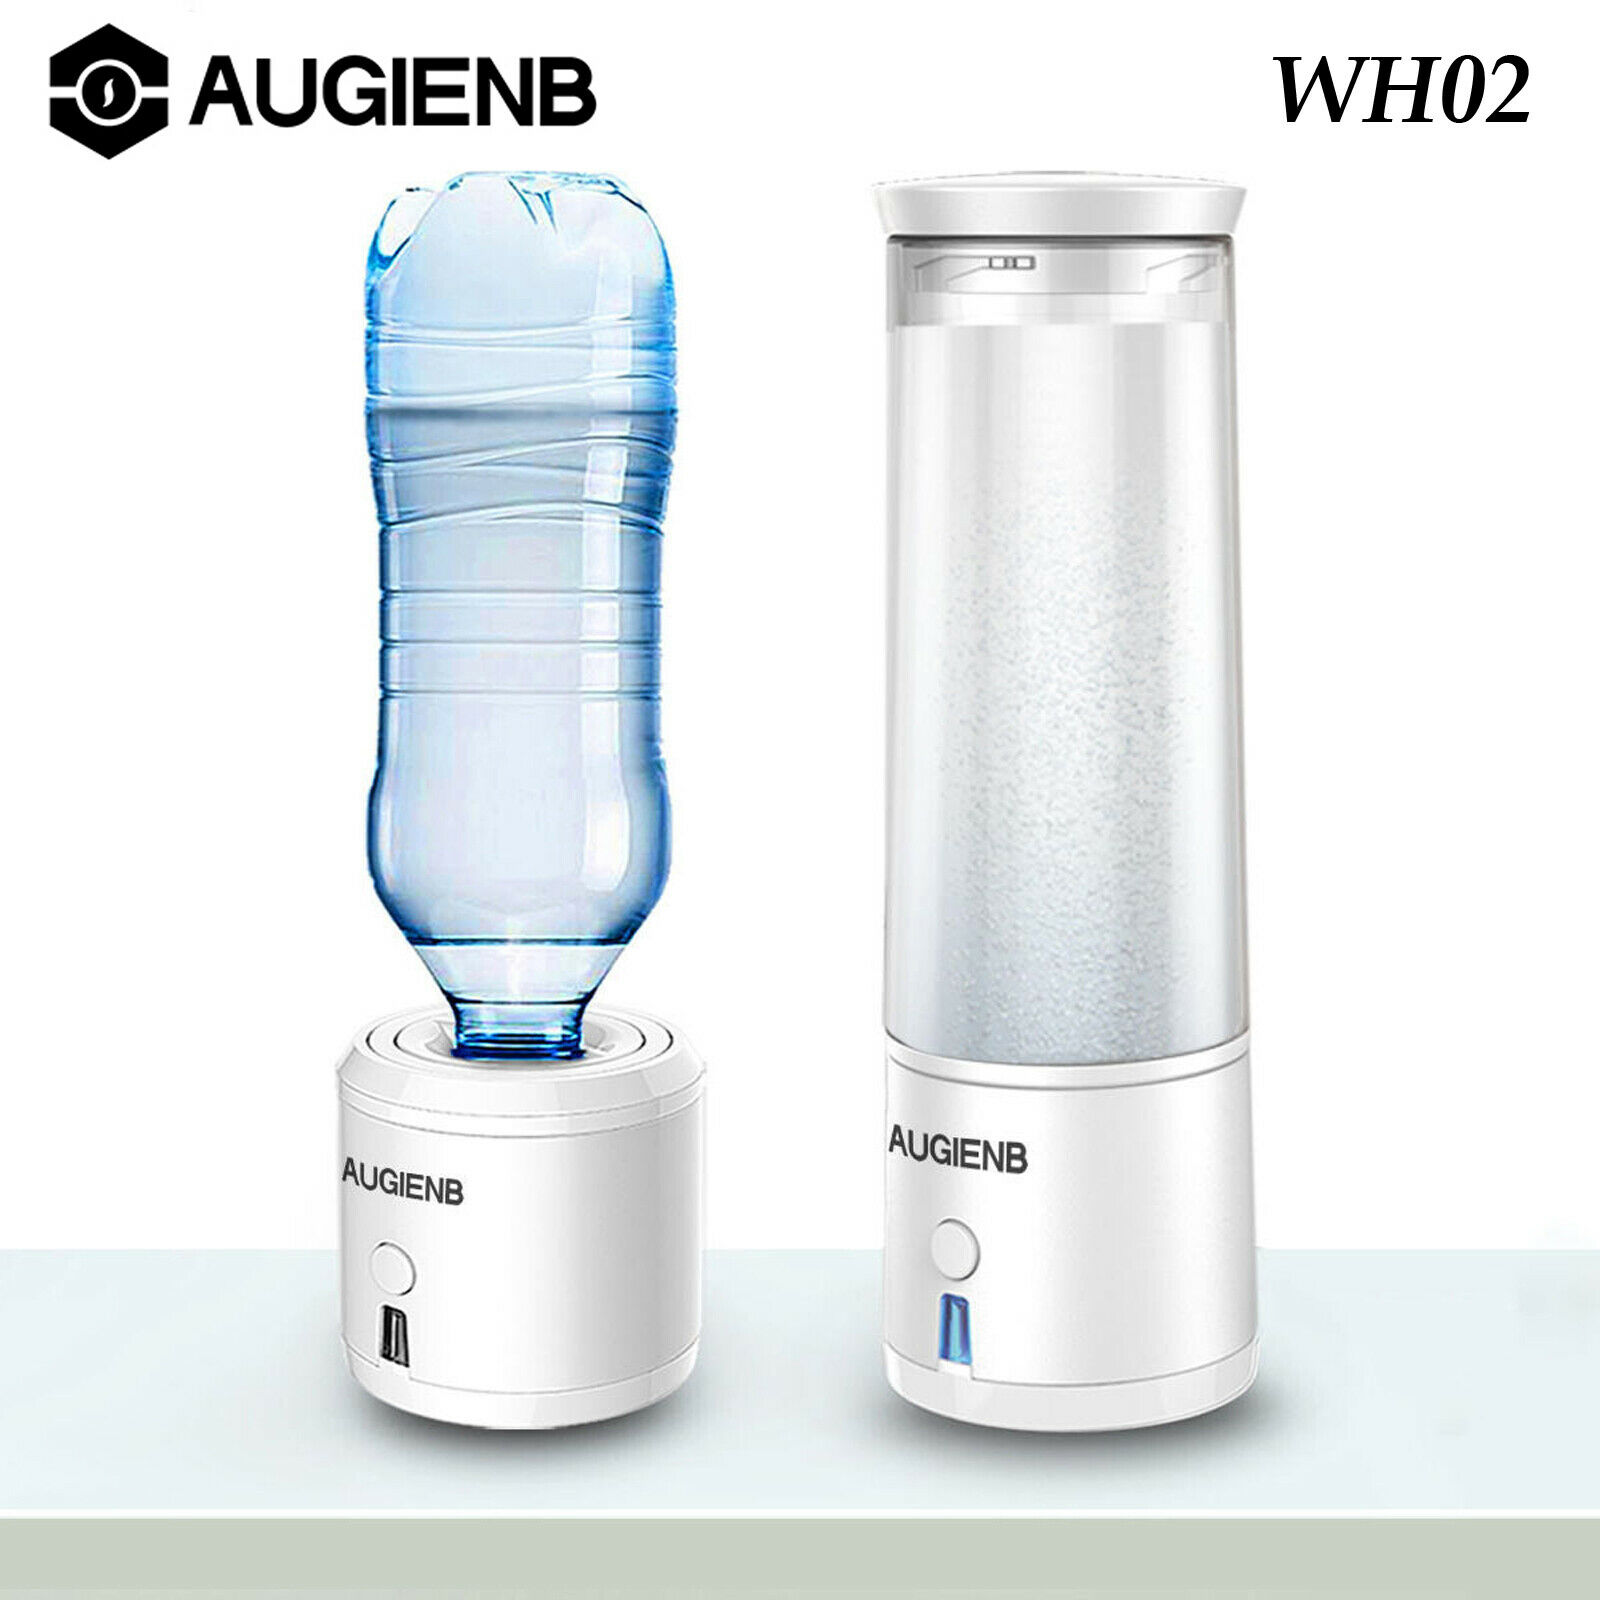 AUGIENB WH02 USB Charging portable Hydrogen eau Alkaline Ionizer Purifier